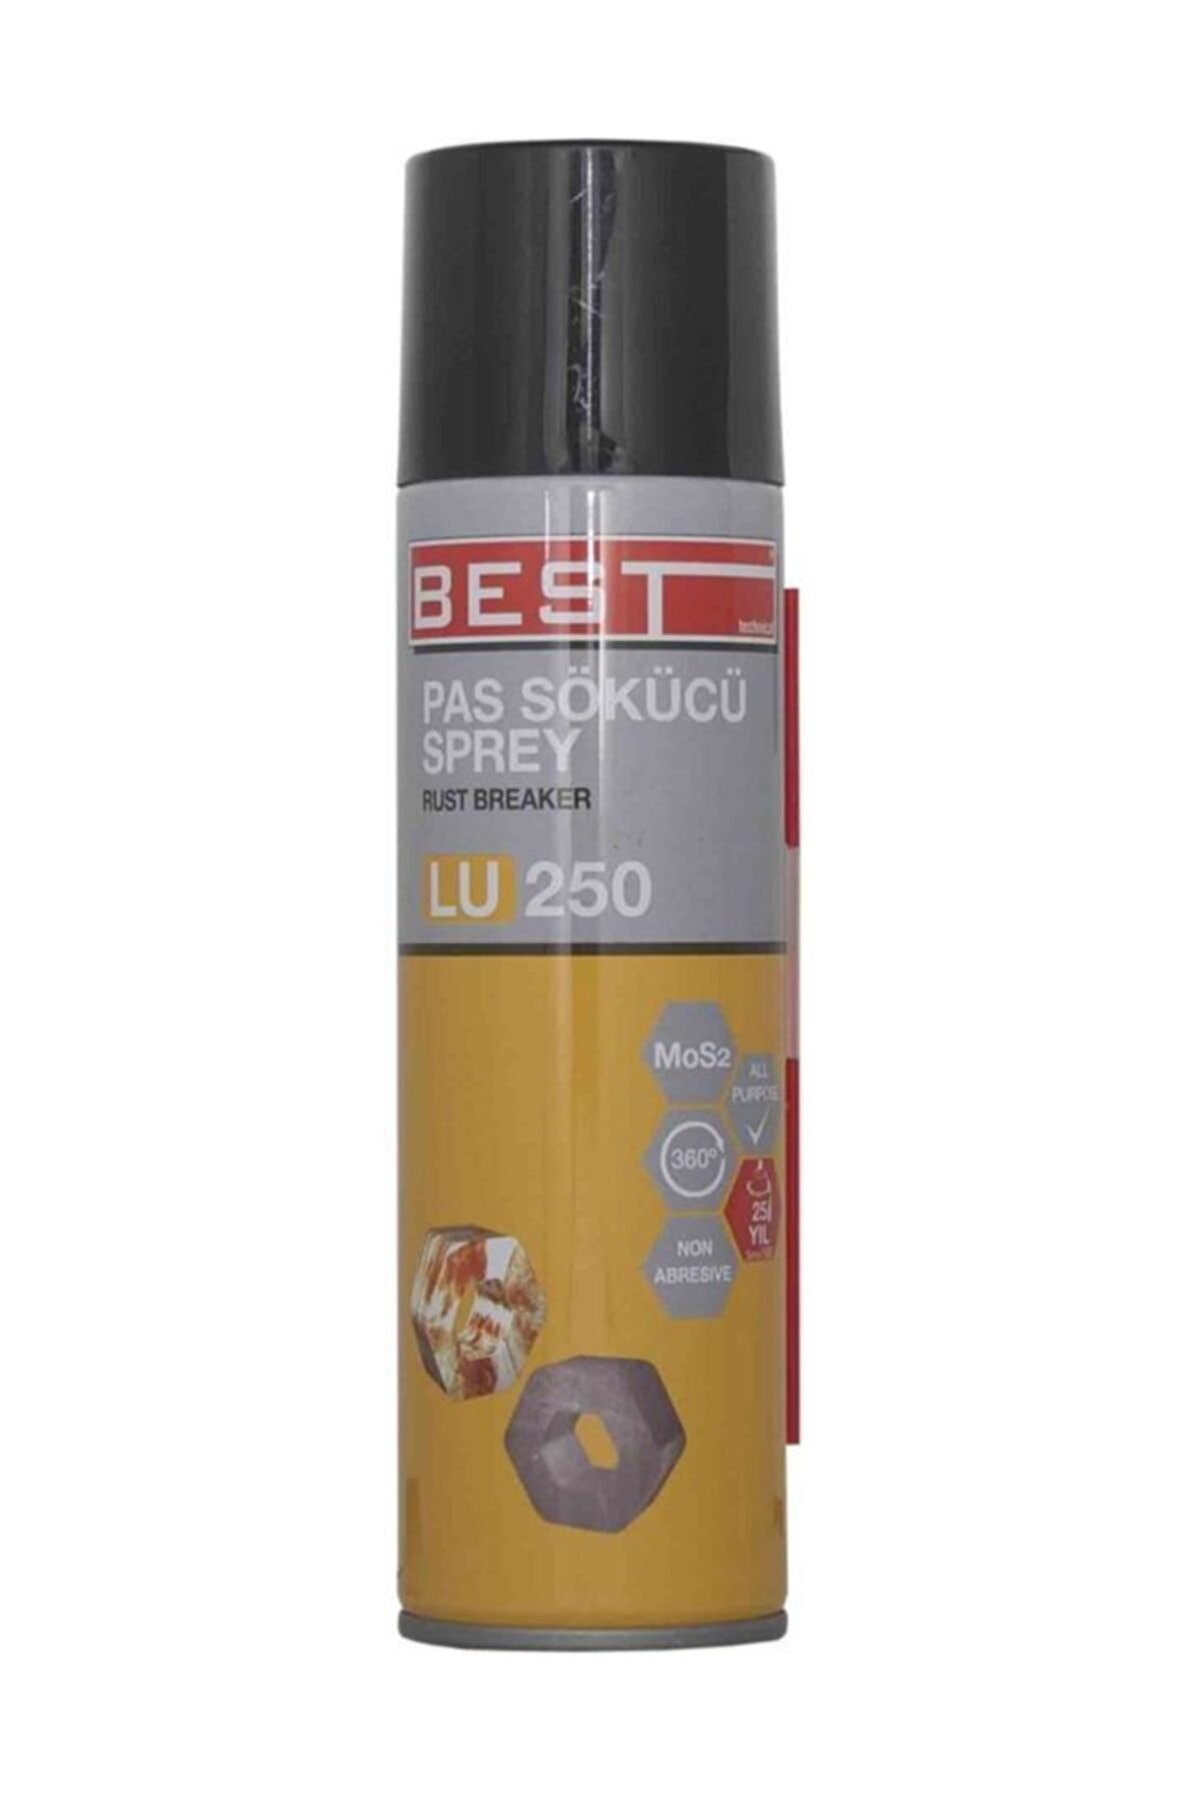 Best Pas Sökücü Spray 250ml 30 Adet